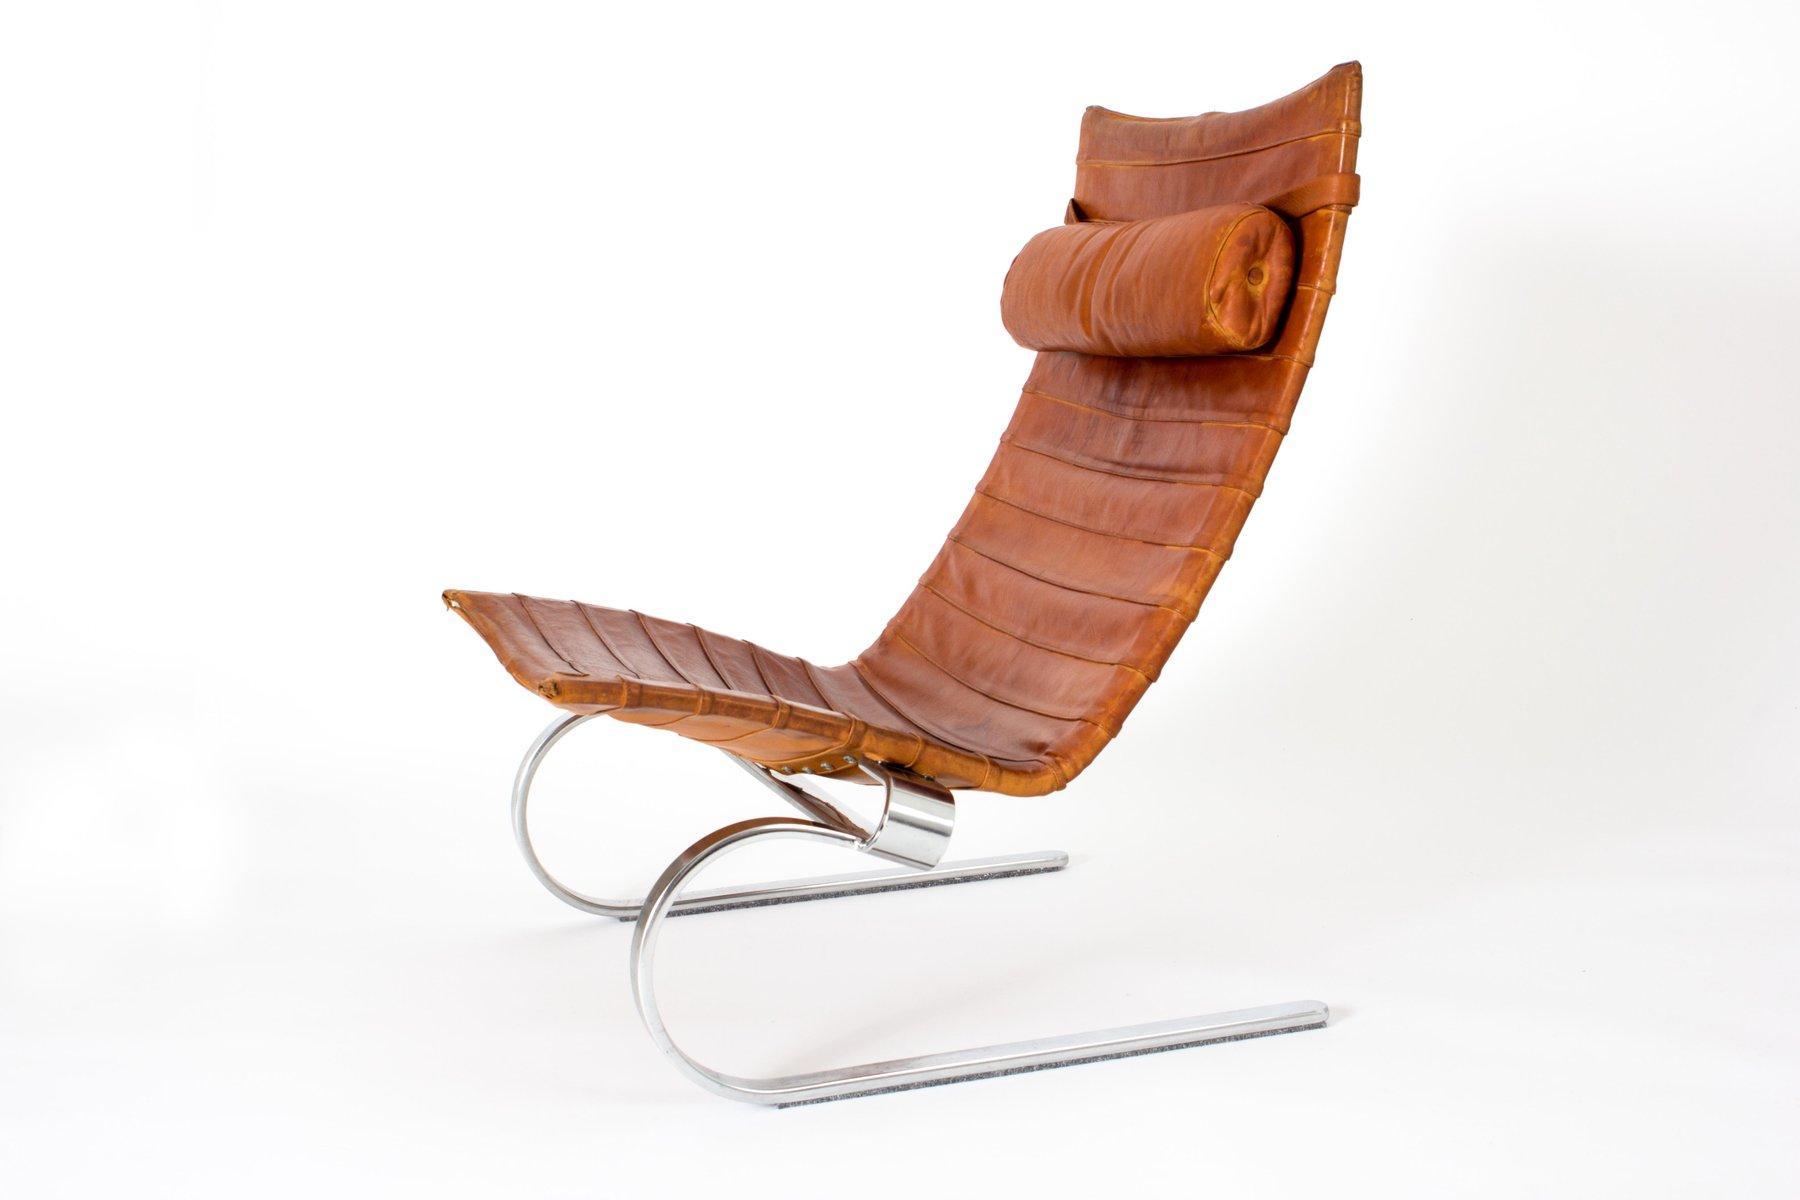 poul kjaerholm furniture. price per piece poul kjaerholm furniture